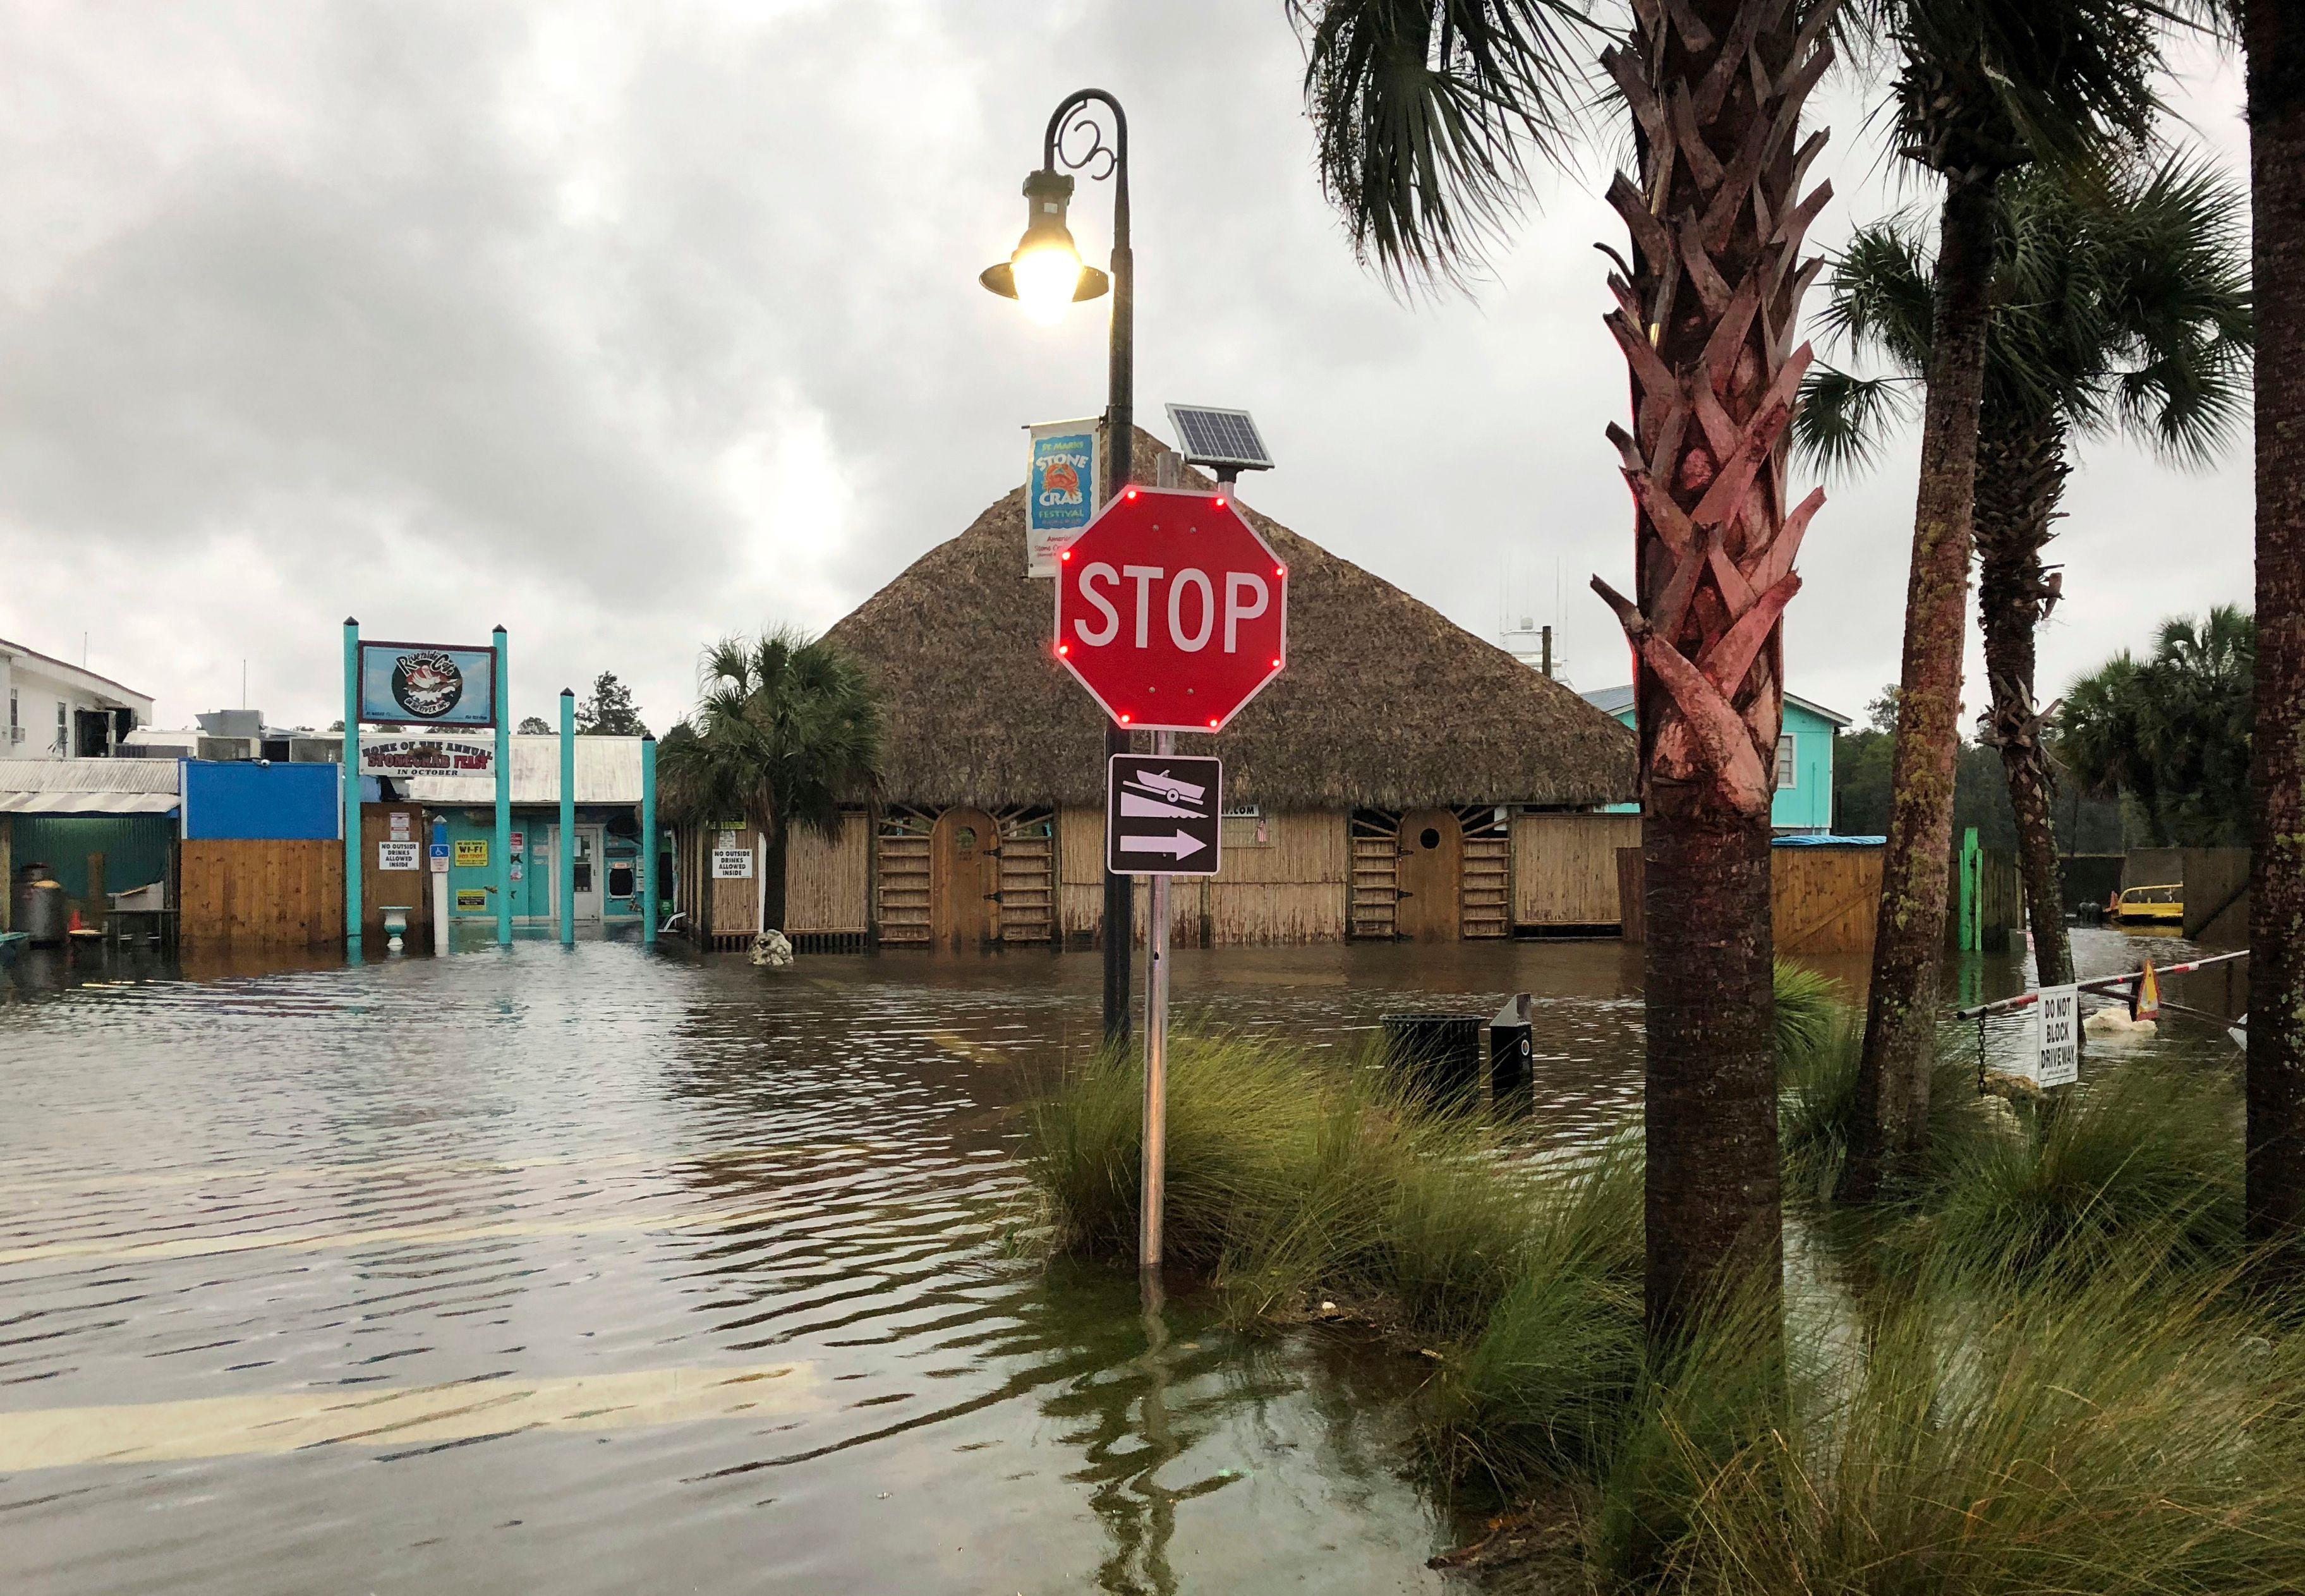 Hurricane Michael New Information On Landfall Times Path Storm Surge More Storm Surge Gulf Coast Florida Bad Storms